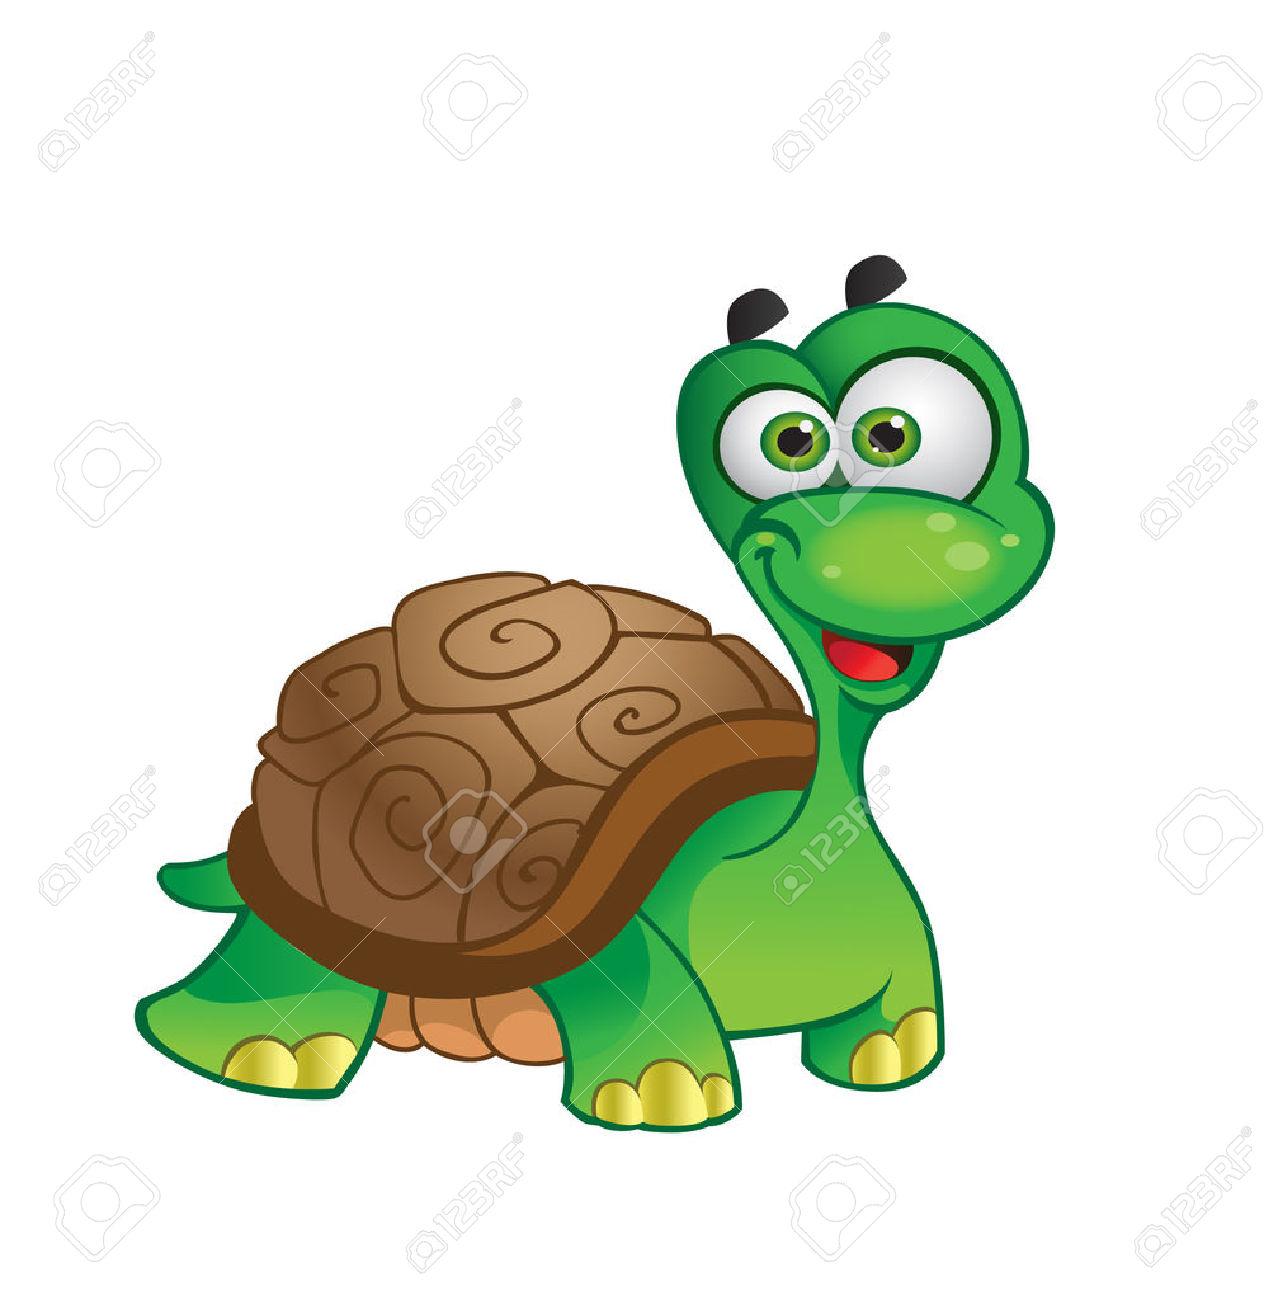 Joyeux anniversaire johann communaut orange - Clipart tortue ...